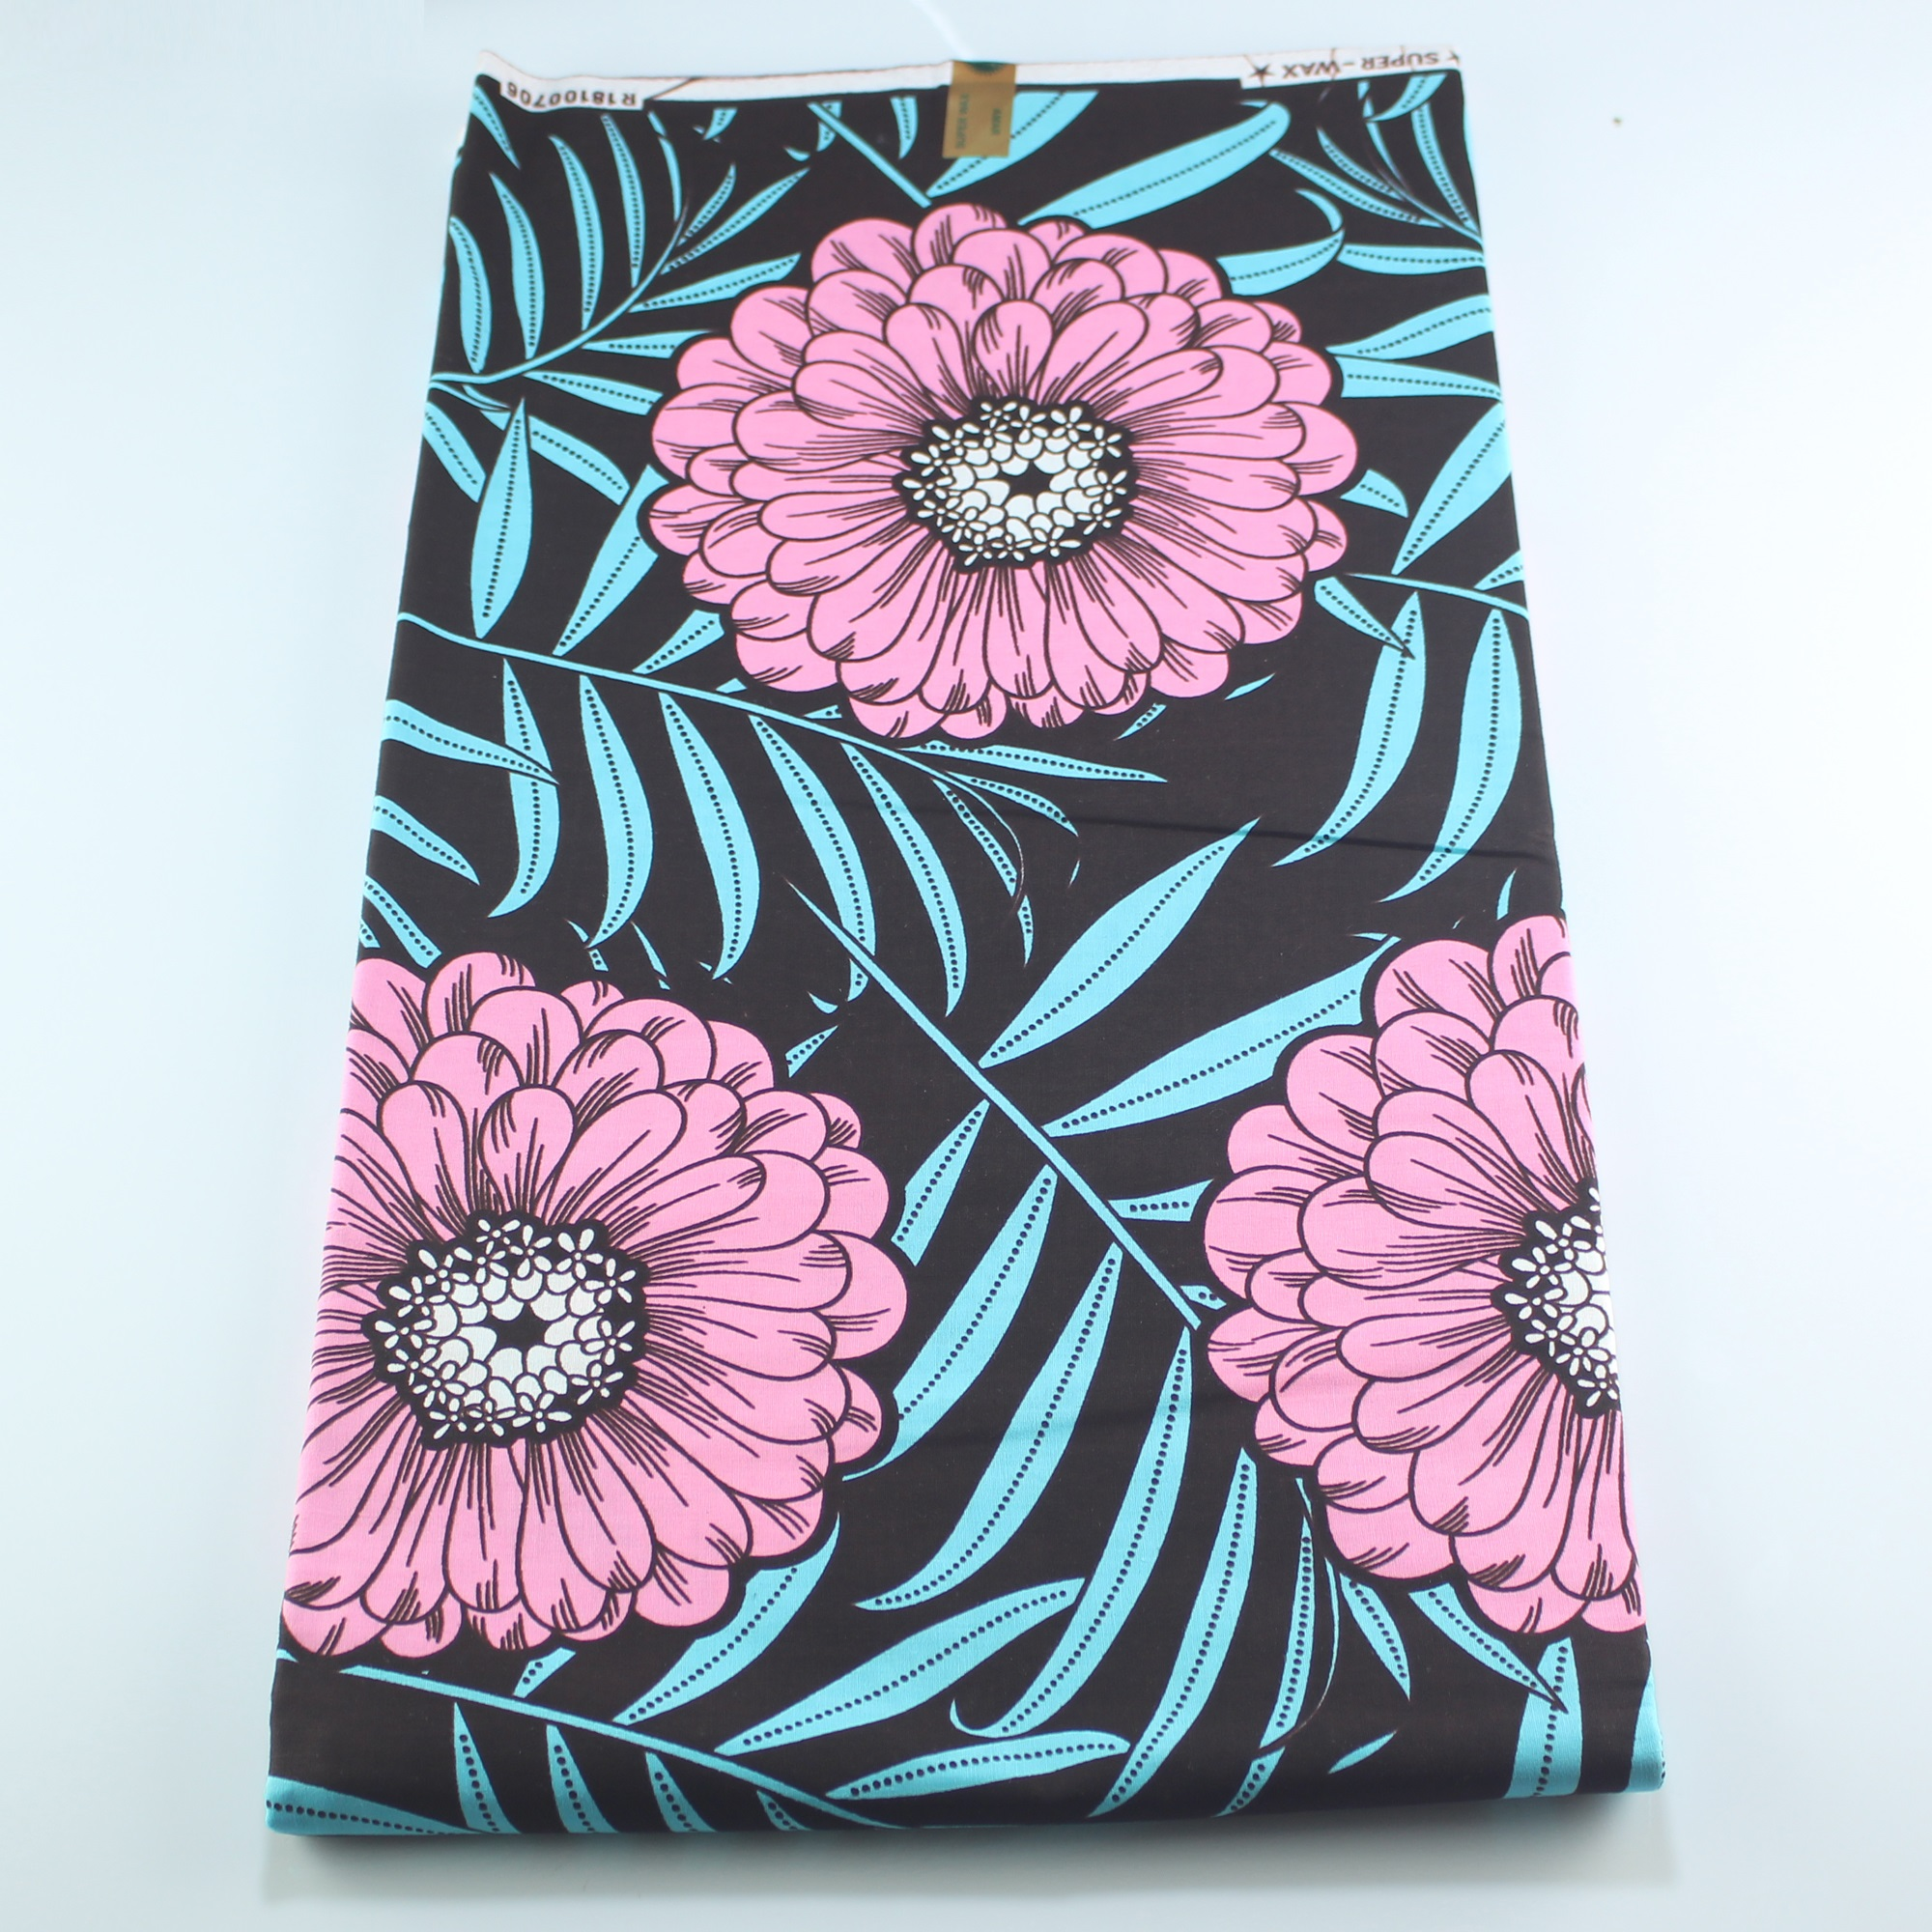 100 Cotton Wax High Quality ankara fabric African fabric 6 yards fabric 2019